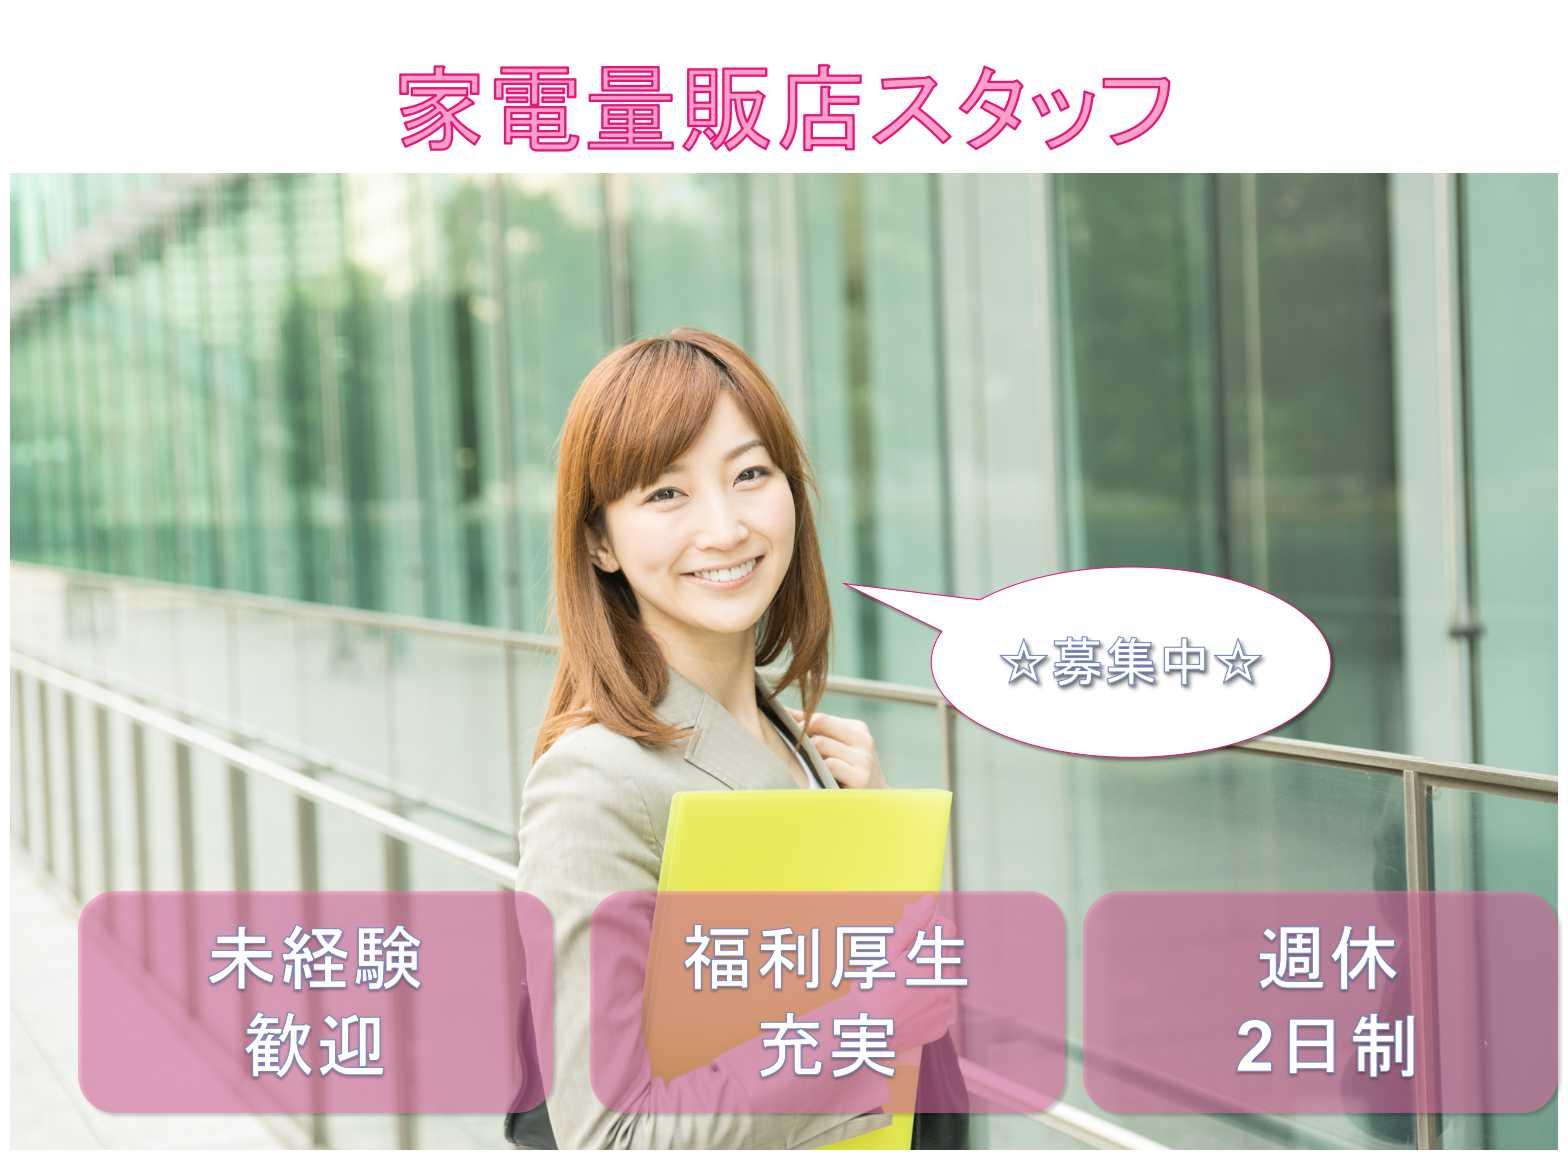 【愛知県西尾市】◆未経験歓迎◆福利厚生充実◆家電量販店スタッフ◆募集中◆ イメージ